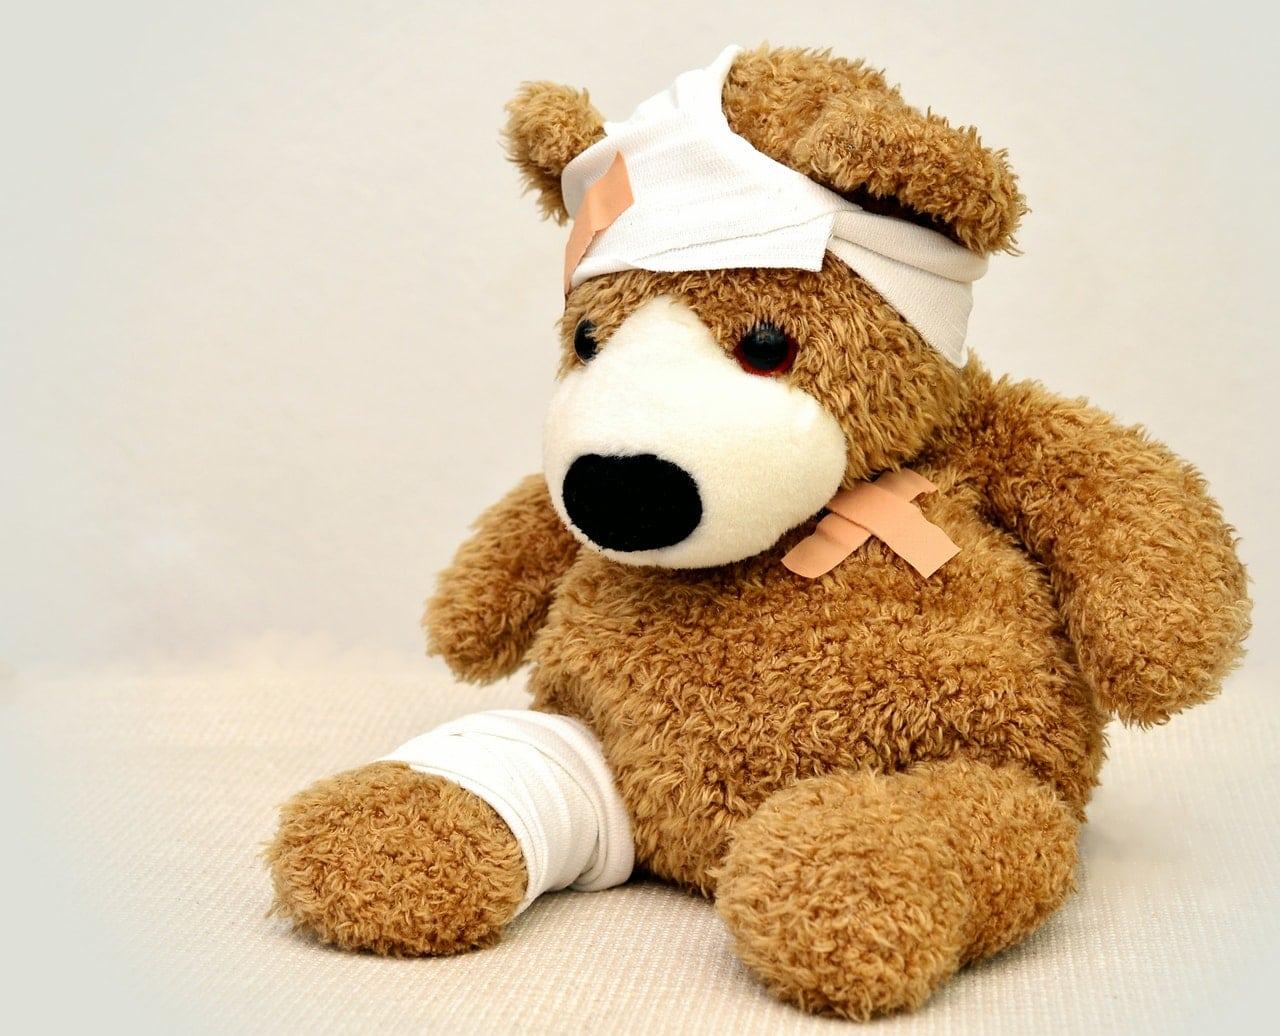 Acute & Chronic Injuries